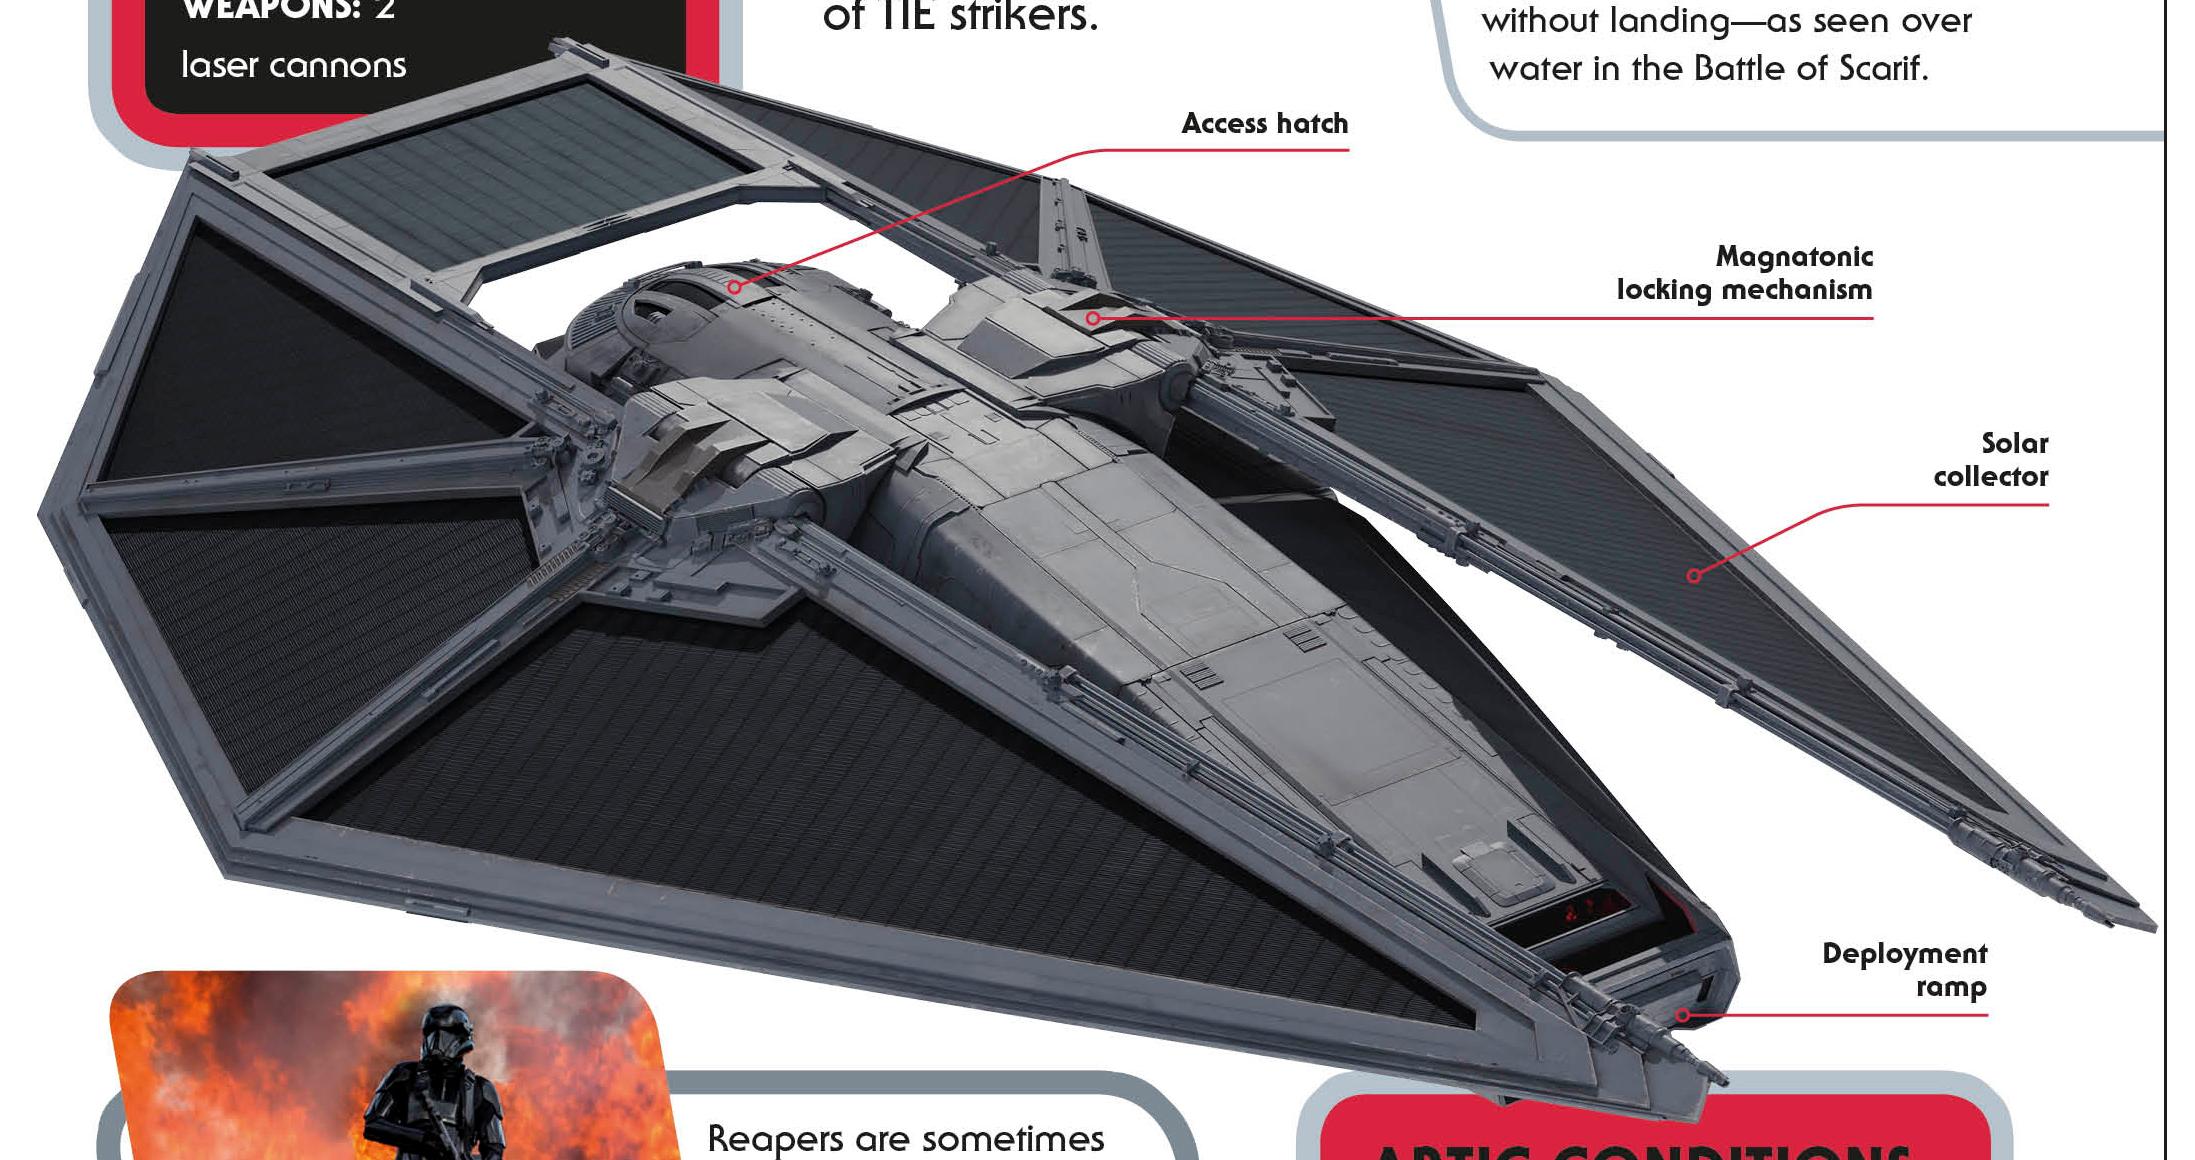 Tie Rp Reaper Attack Lander Wookieepedia Fandom Powered By Wikia Star Wars Spaceships Star Wars Ships Star Wars Vehicles